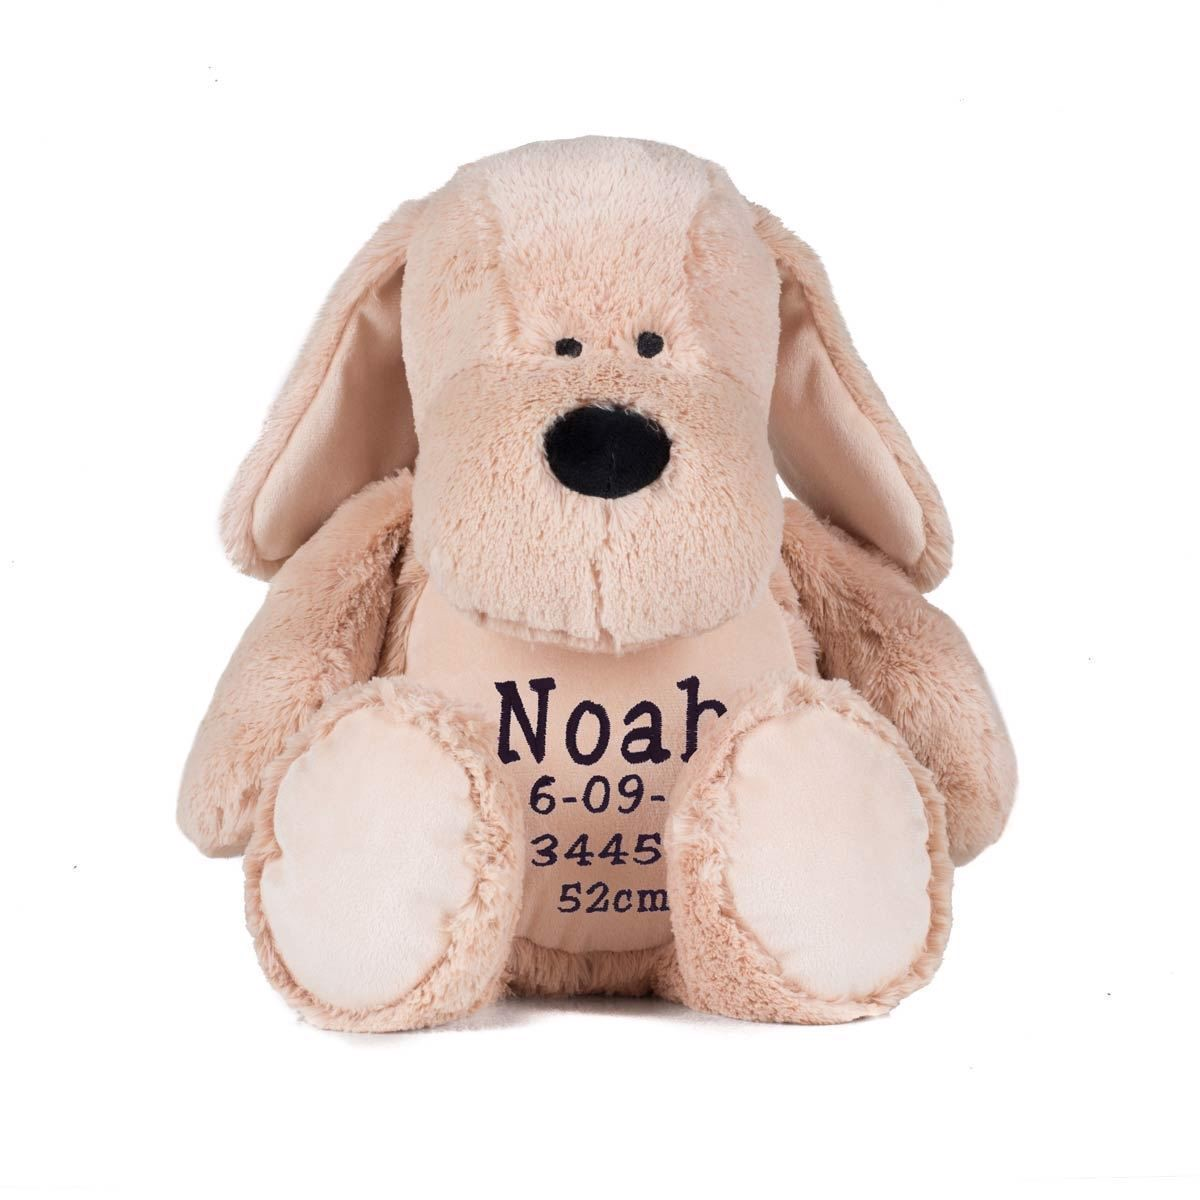 Bamse hund med navn